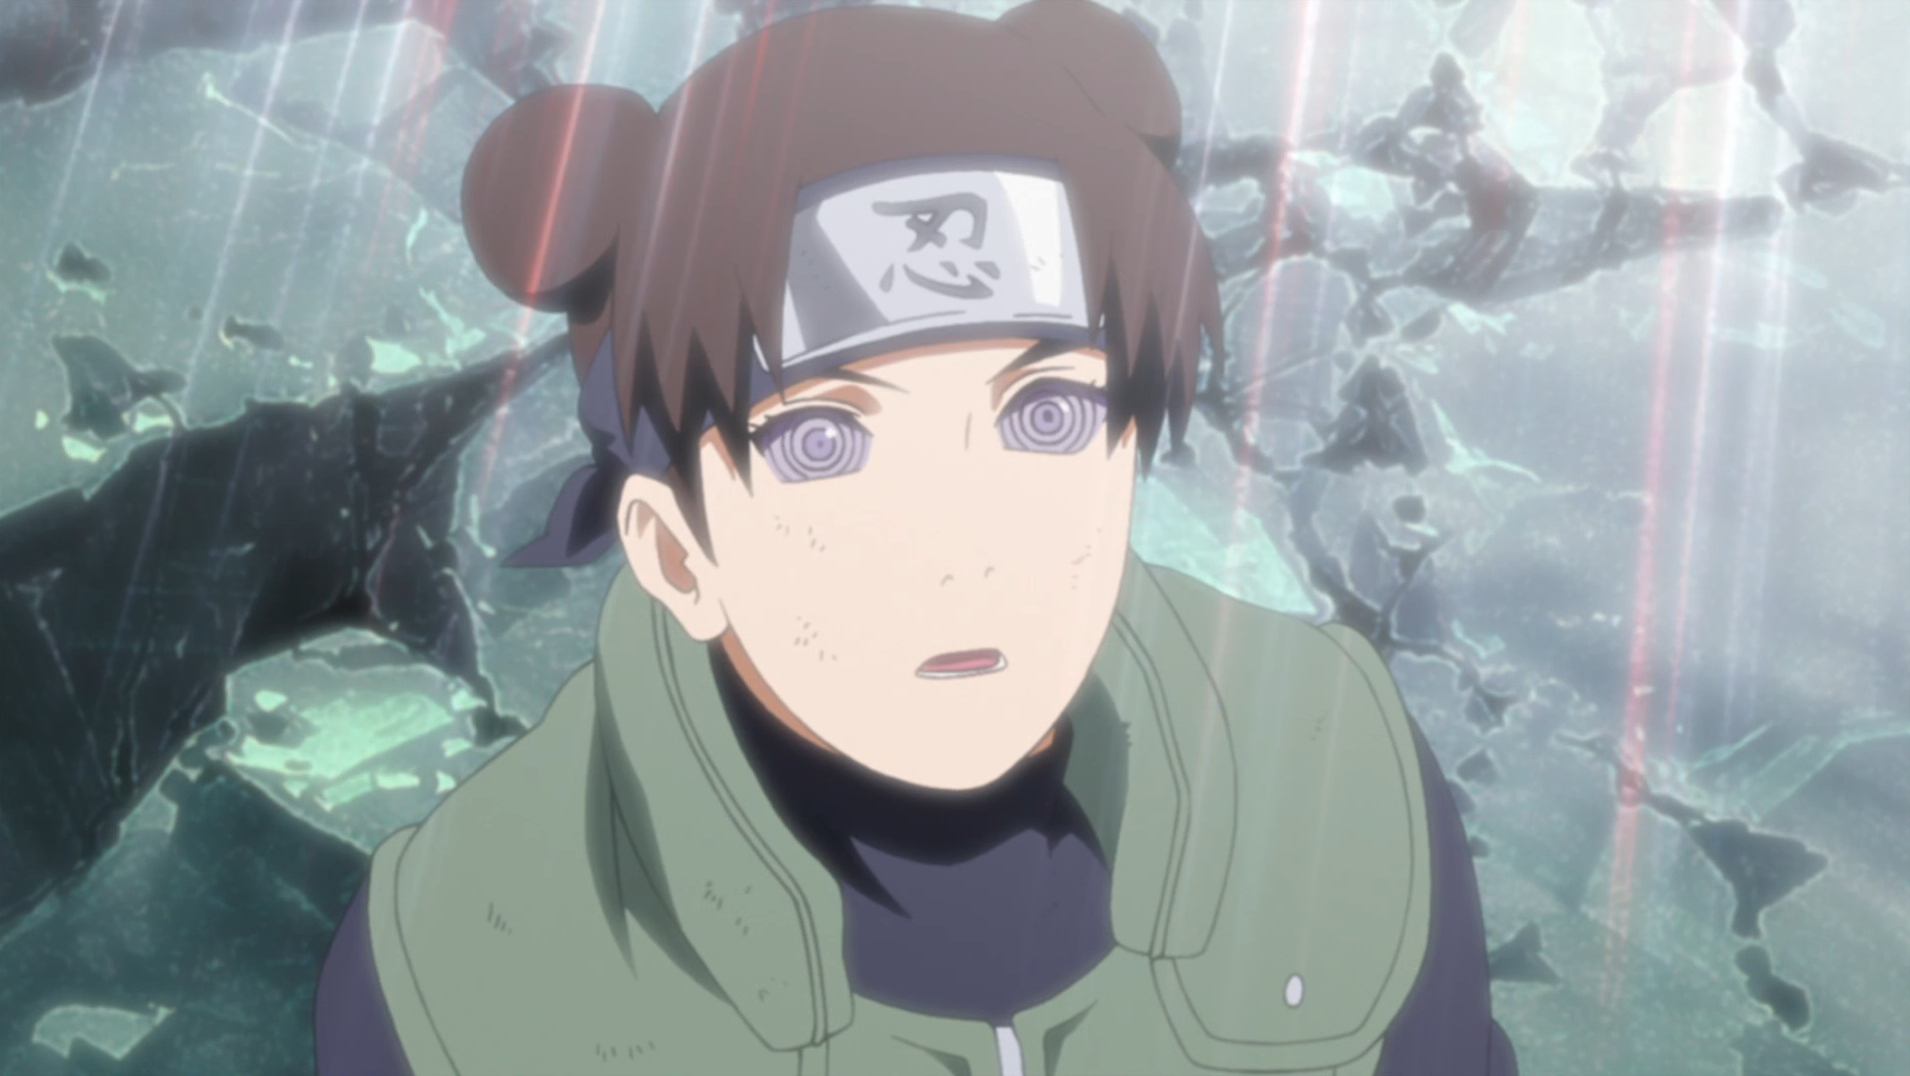 Tenten | Narutopedia | FANDOM powered by Wikia